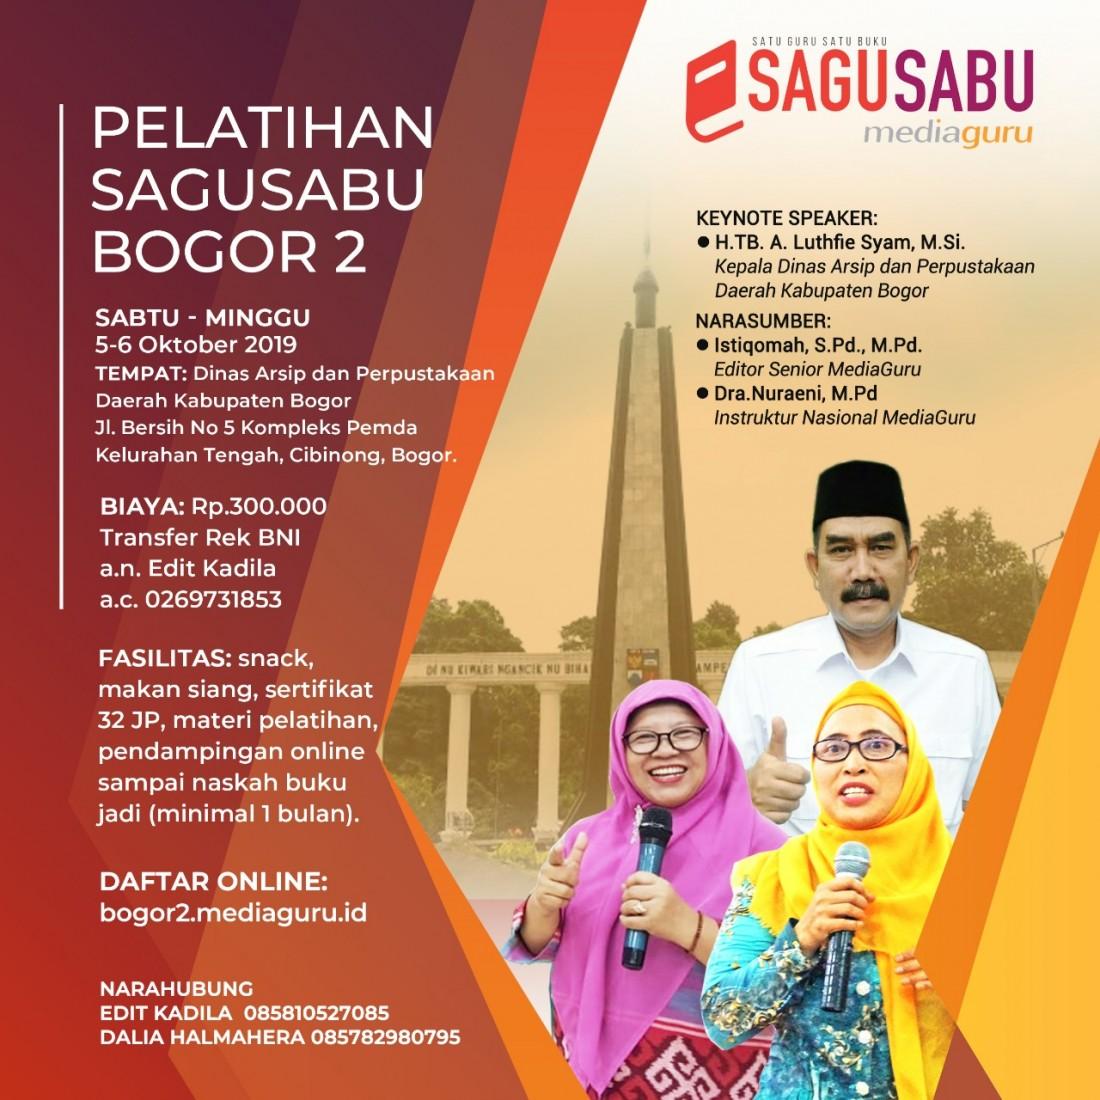 Pelatihan Menulis Sagusabu Bogor II (5 - 6 Oktober 2019)